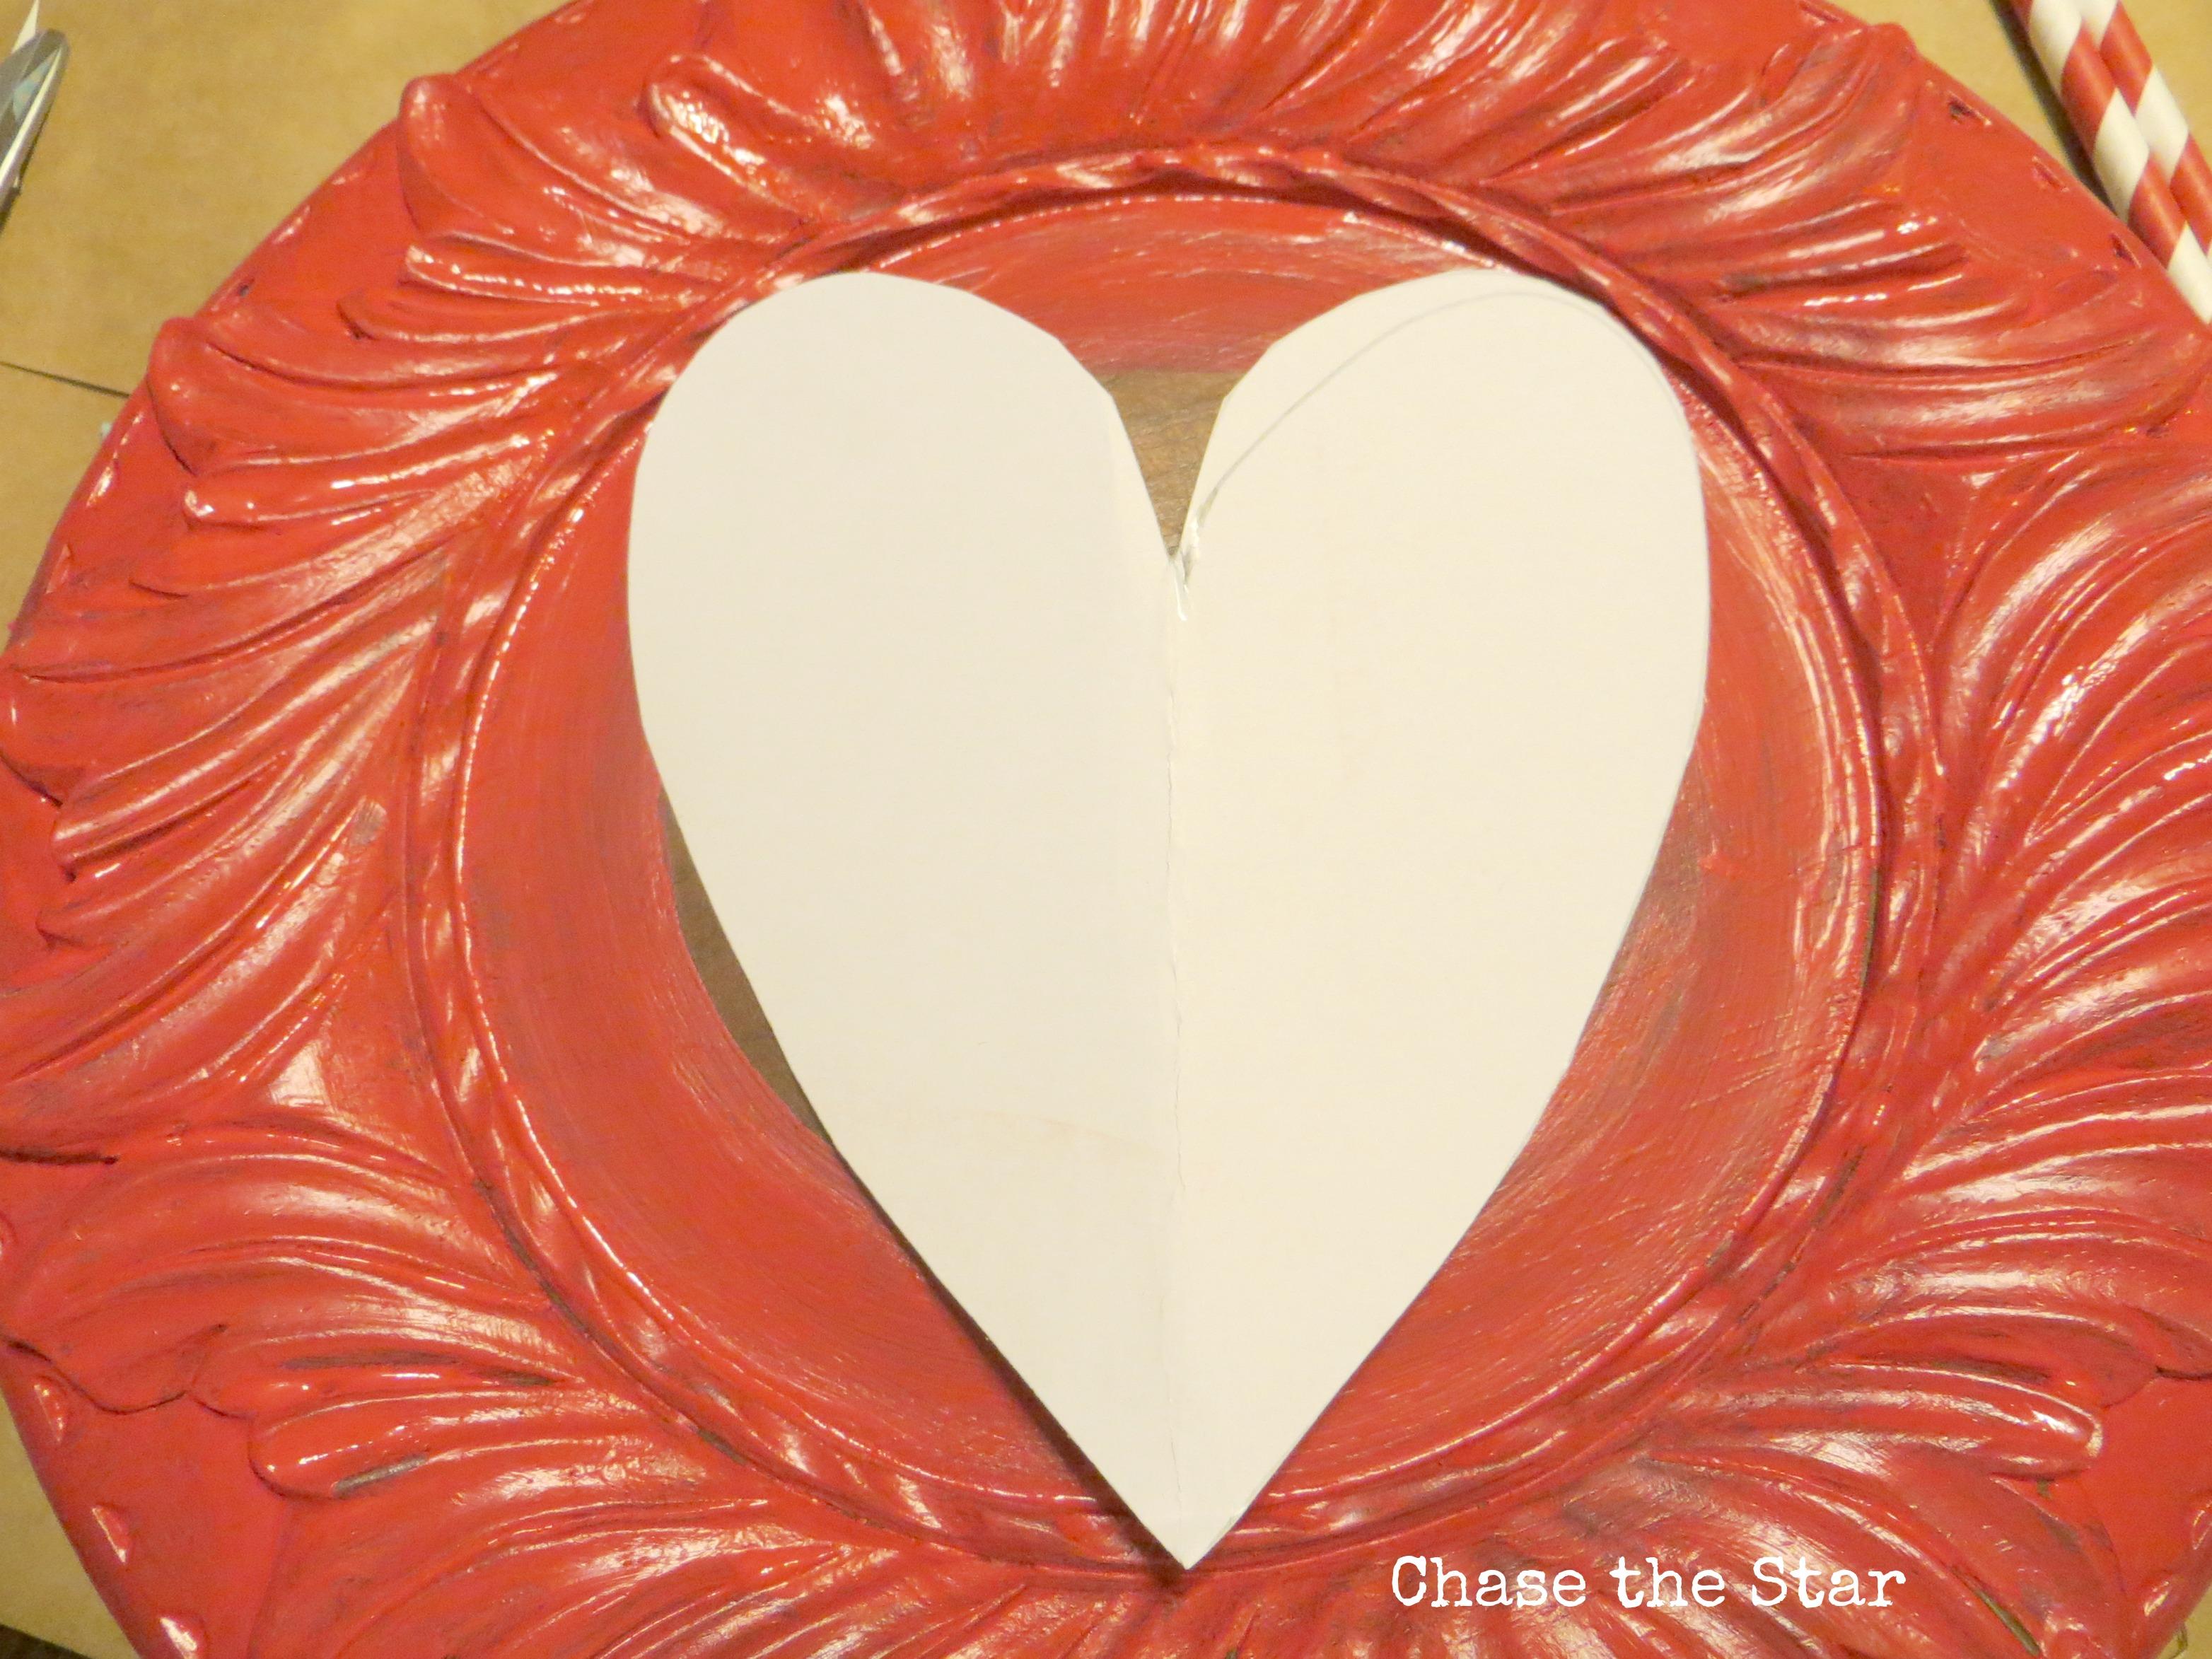 heart, love, valentines day, charger, sunburst, diy craft